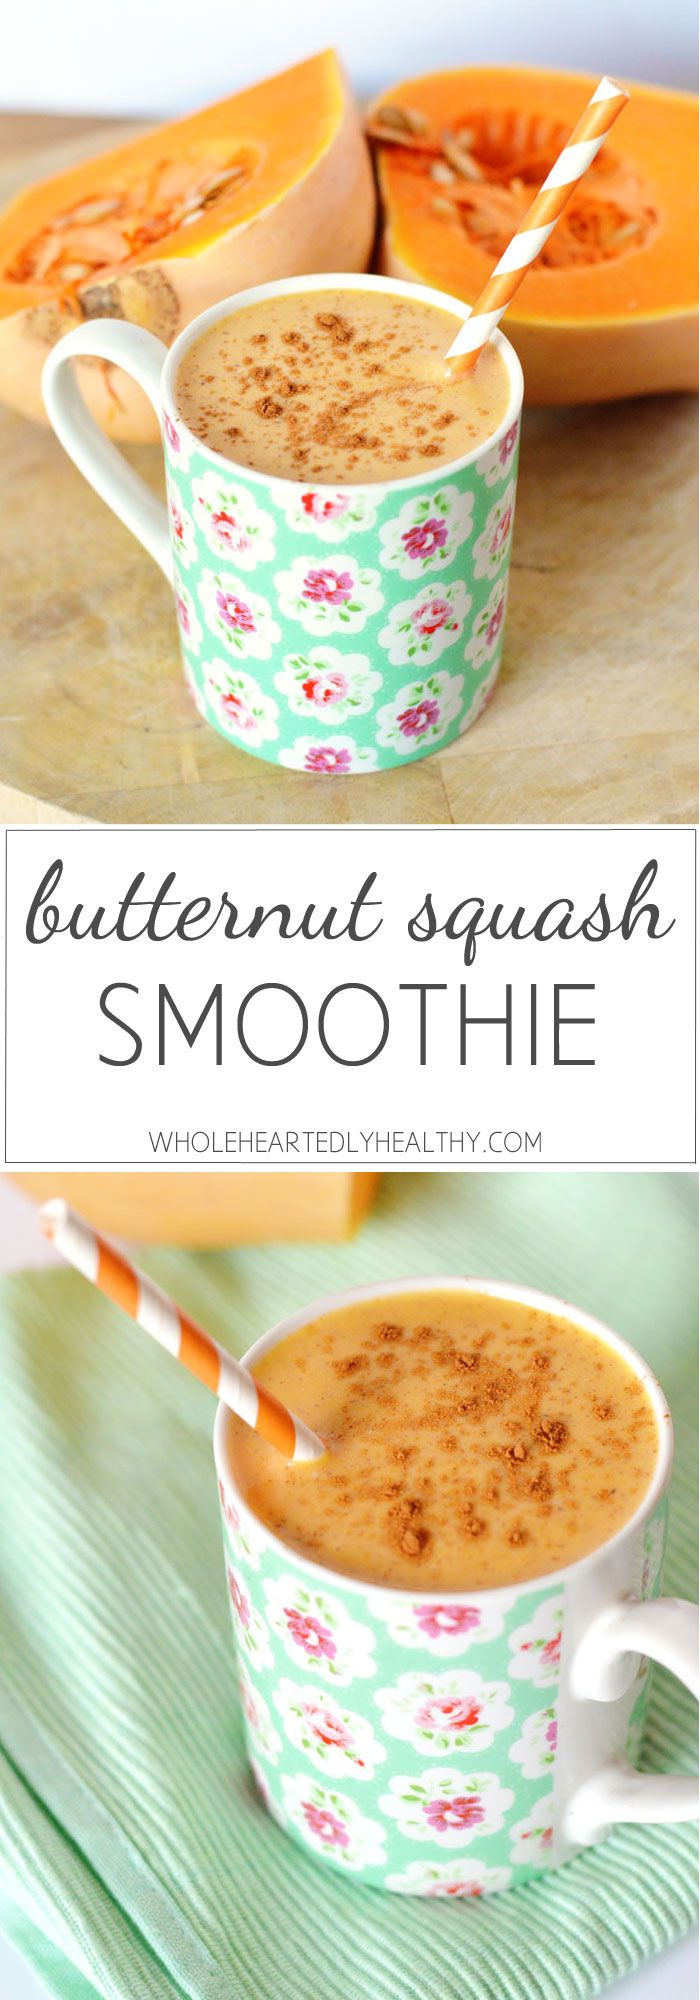 butternut-squash-smoothie-recipe.jpg. swap protein powder for hemp perhaps?